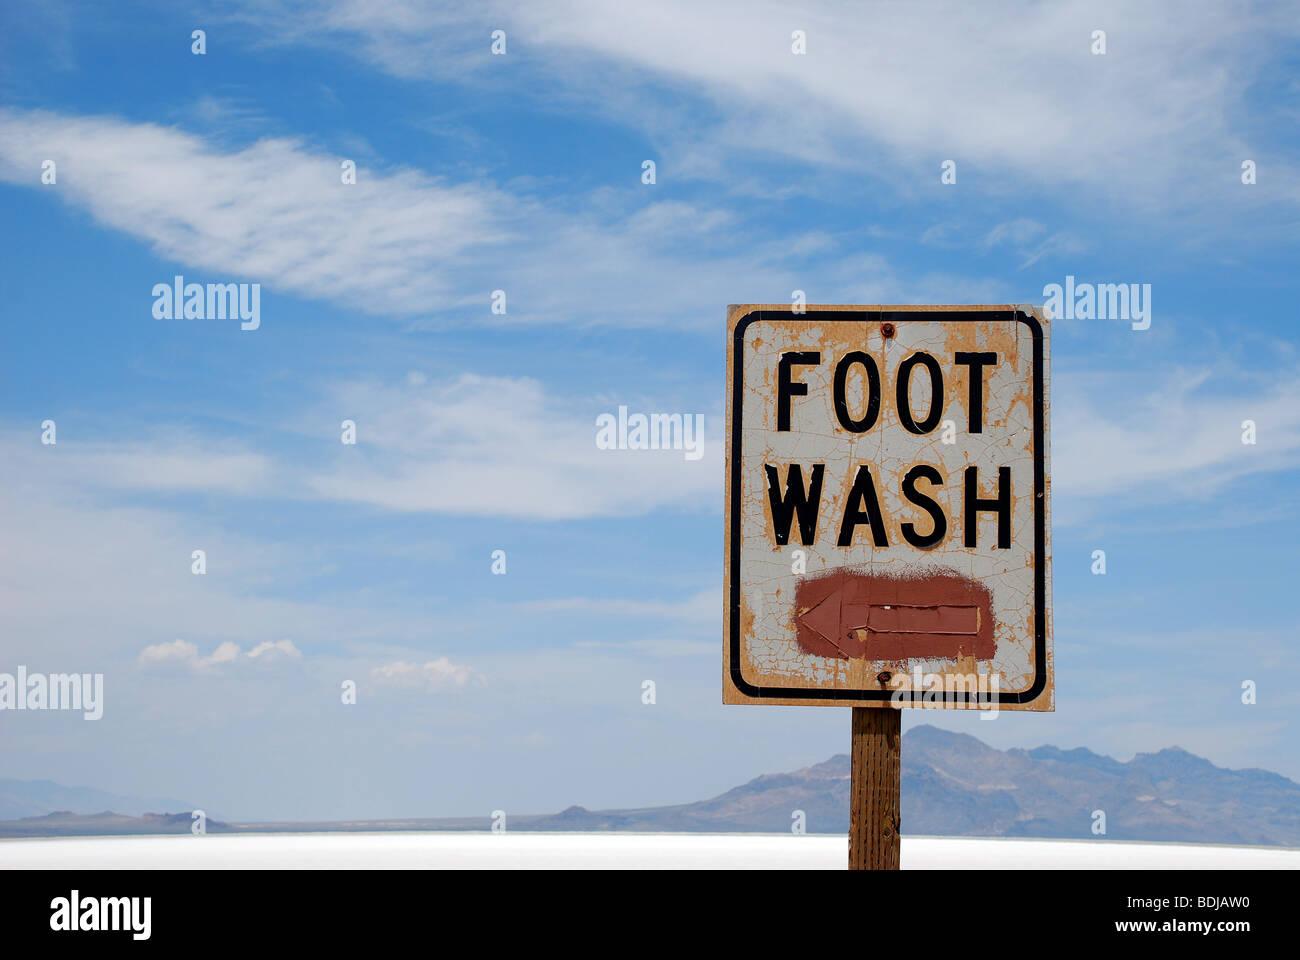 Foot Wash sign at the Bonneville Salt Flats, Utah, USA - Stock Image